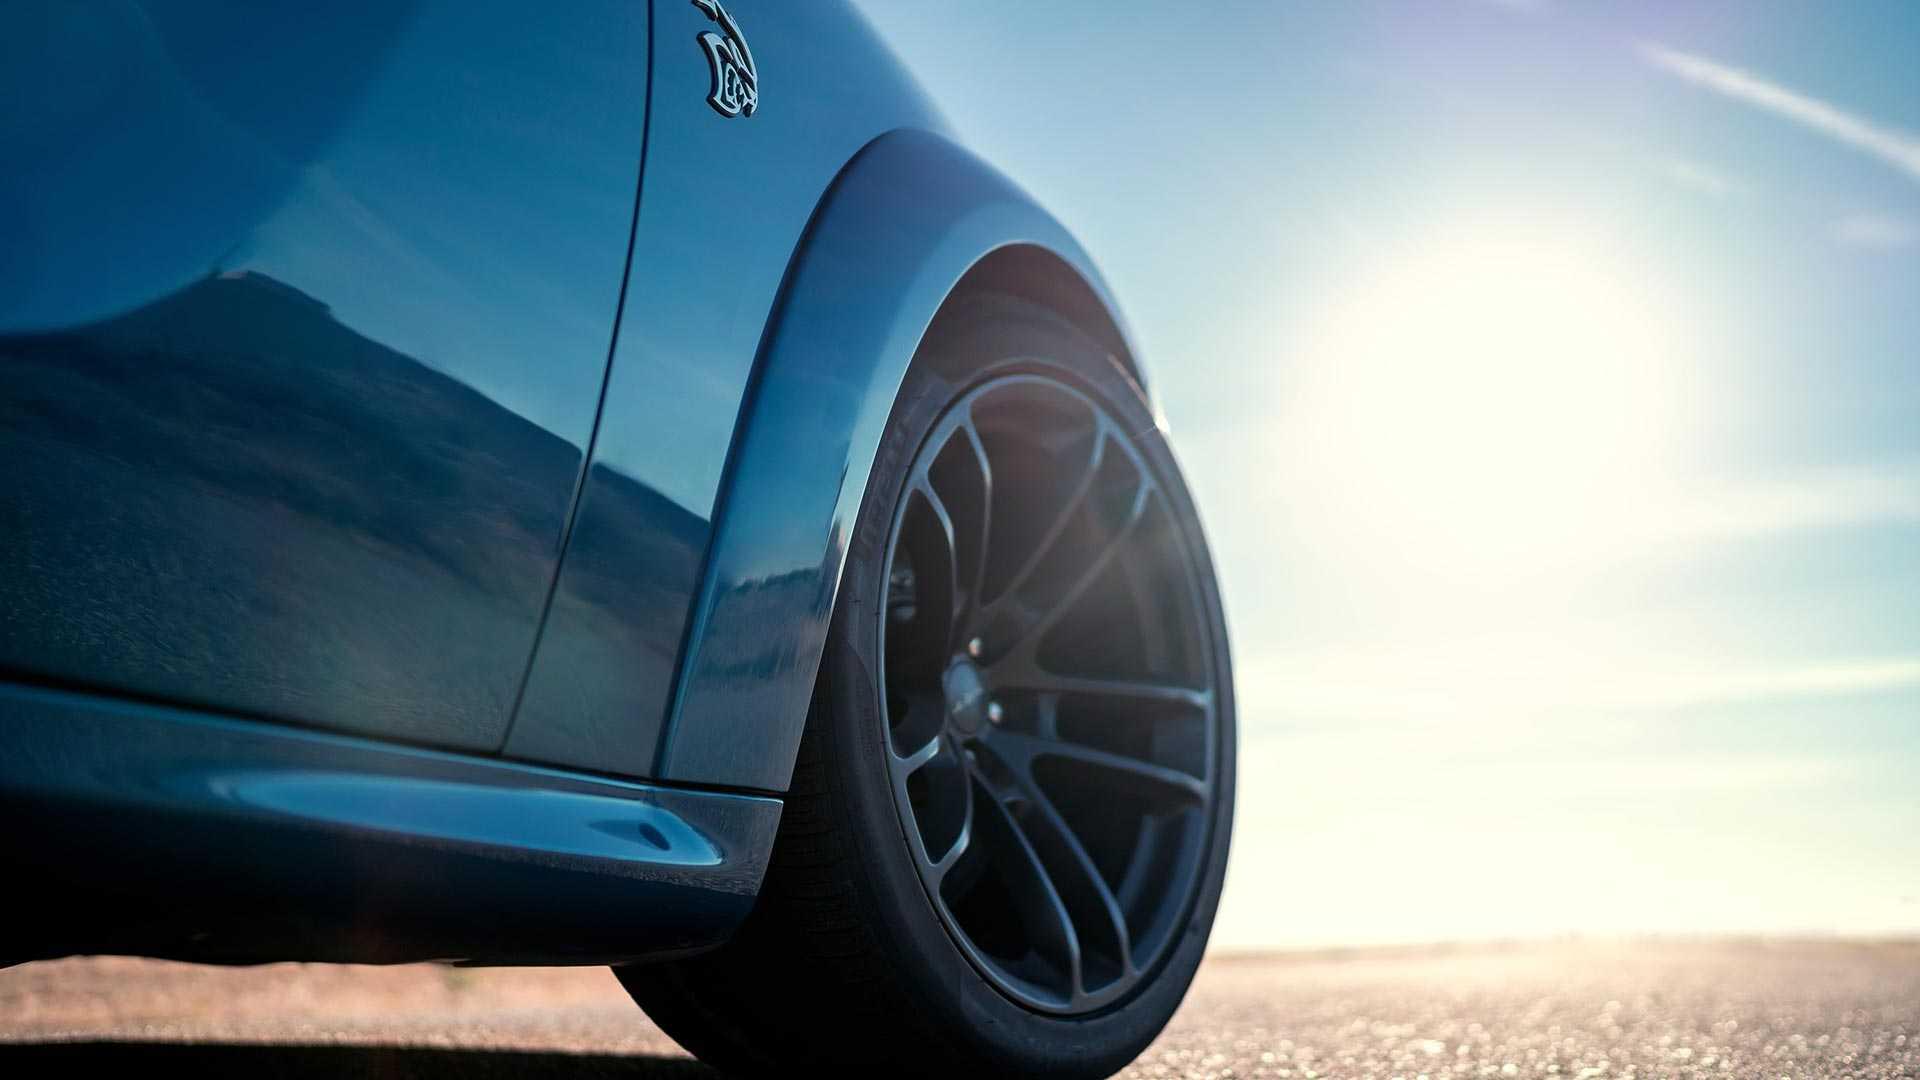 2020 Dodge Charger SRT Hellcat Widebody Wheel Wallpapers #47 of 79